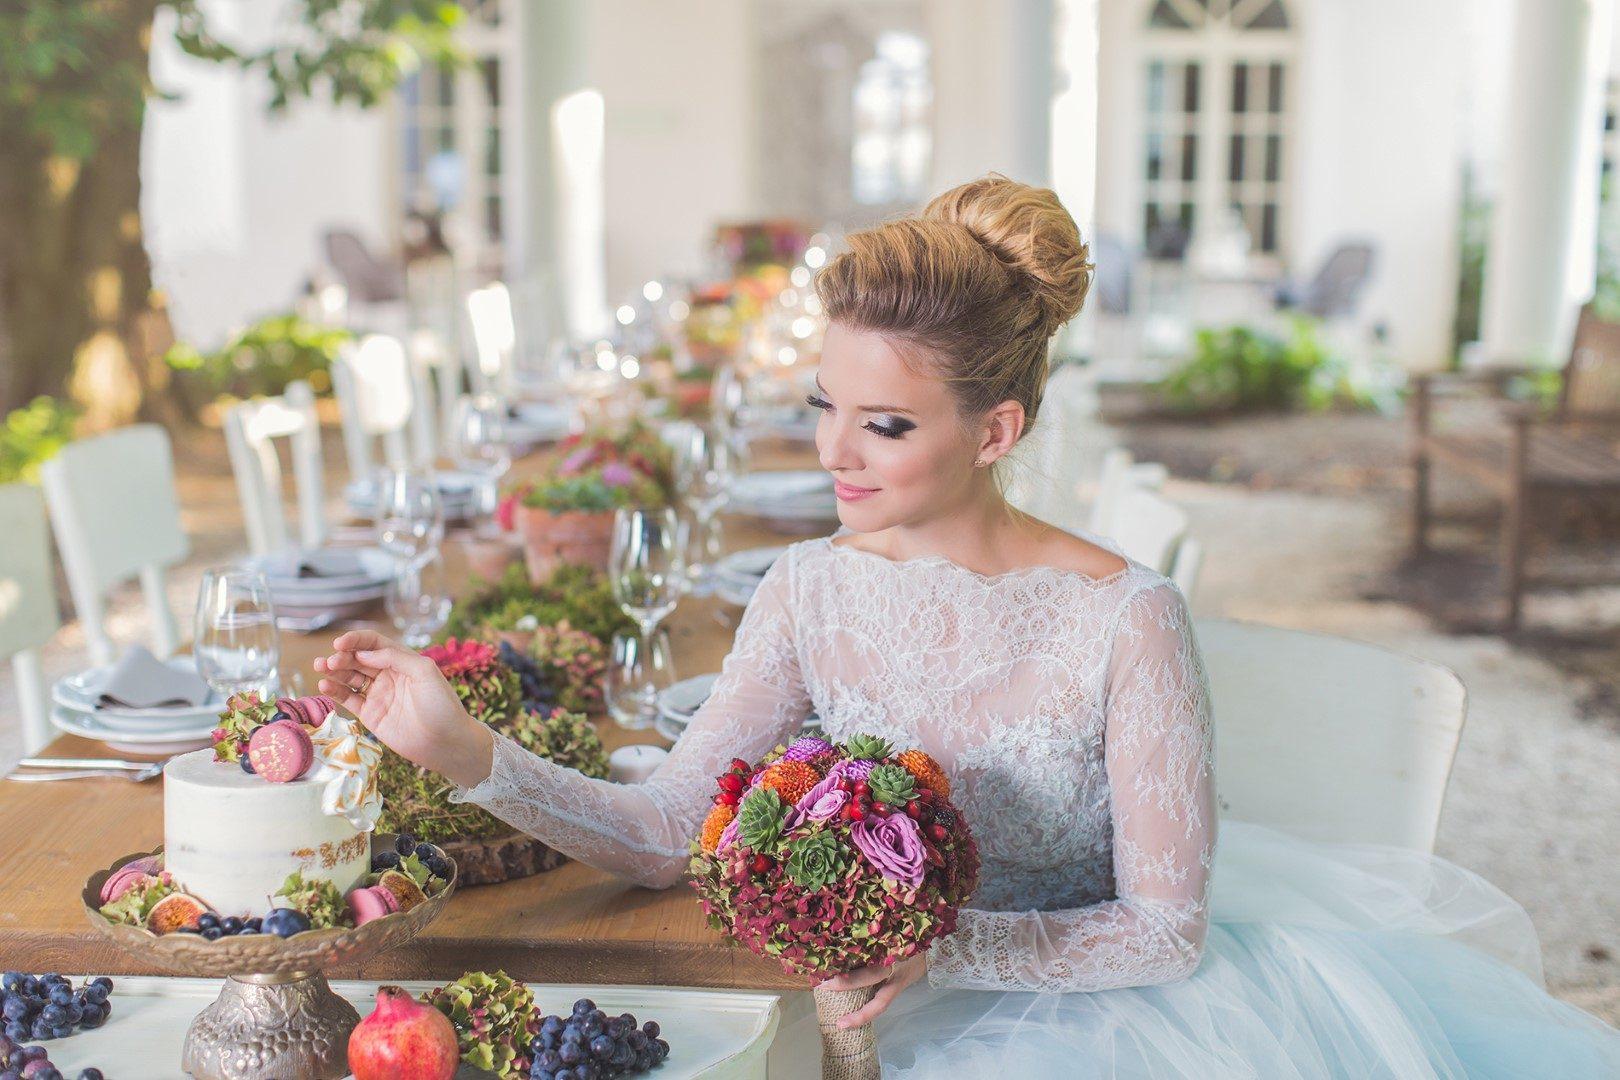 ,fénylabor,fénylabor esküvő,esküvő,esküvői fotók,esküvőfotós,esküvő fotós,esküvői fotós,legjobb fotós,legjobb esküvő fotós,